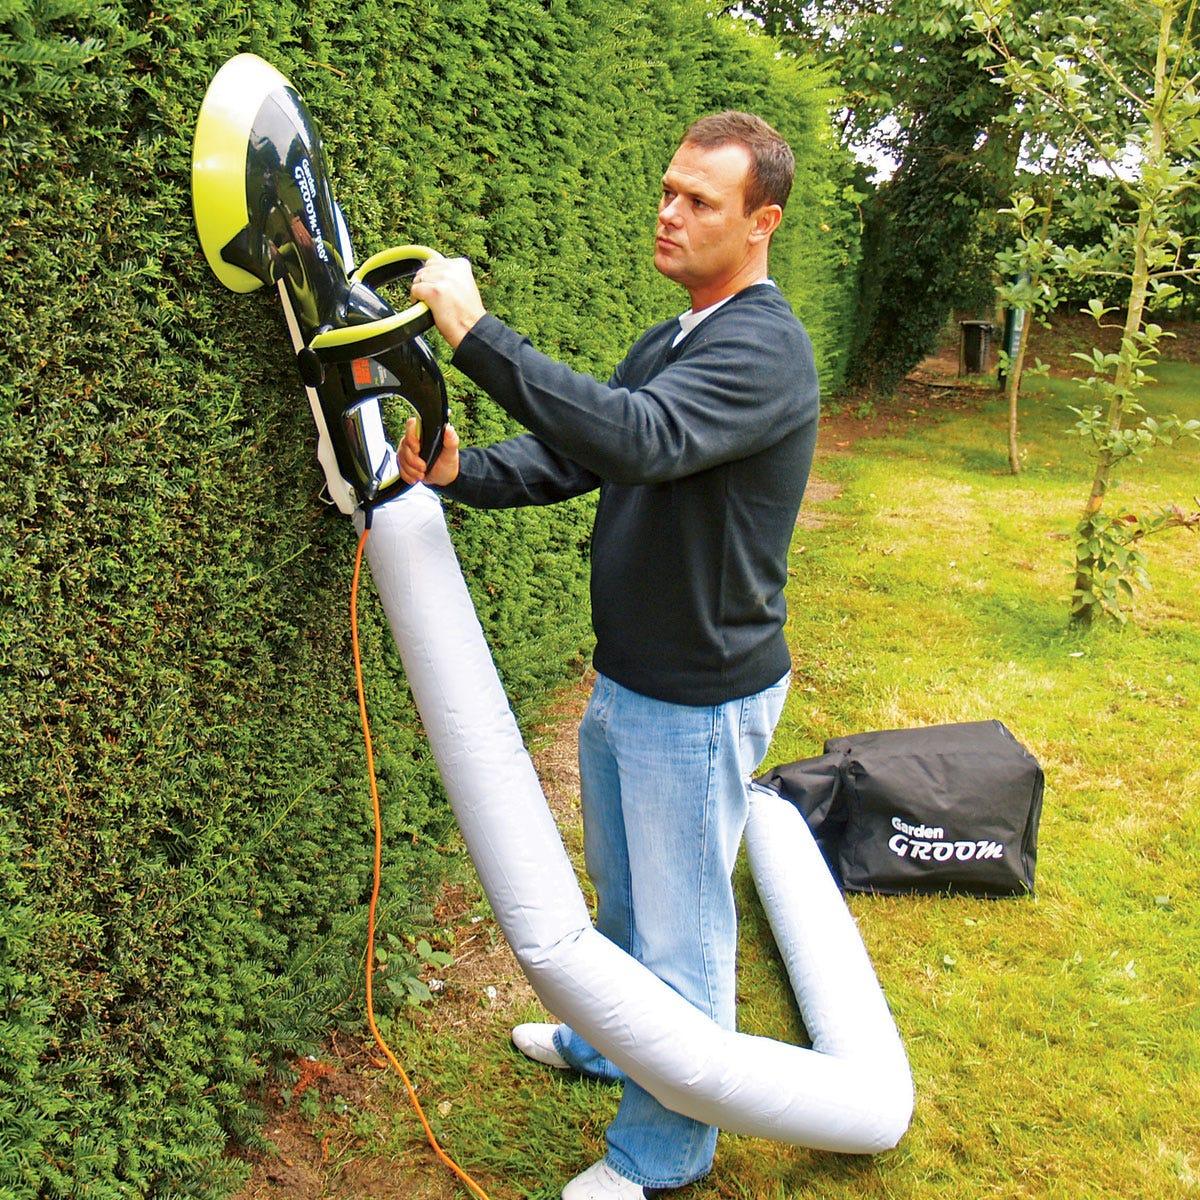 Garden Groom Pro From Sportys Preferred Living